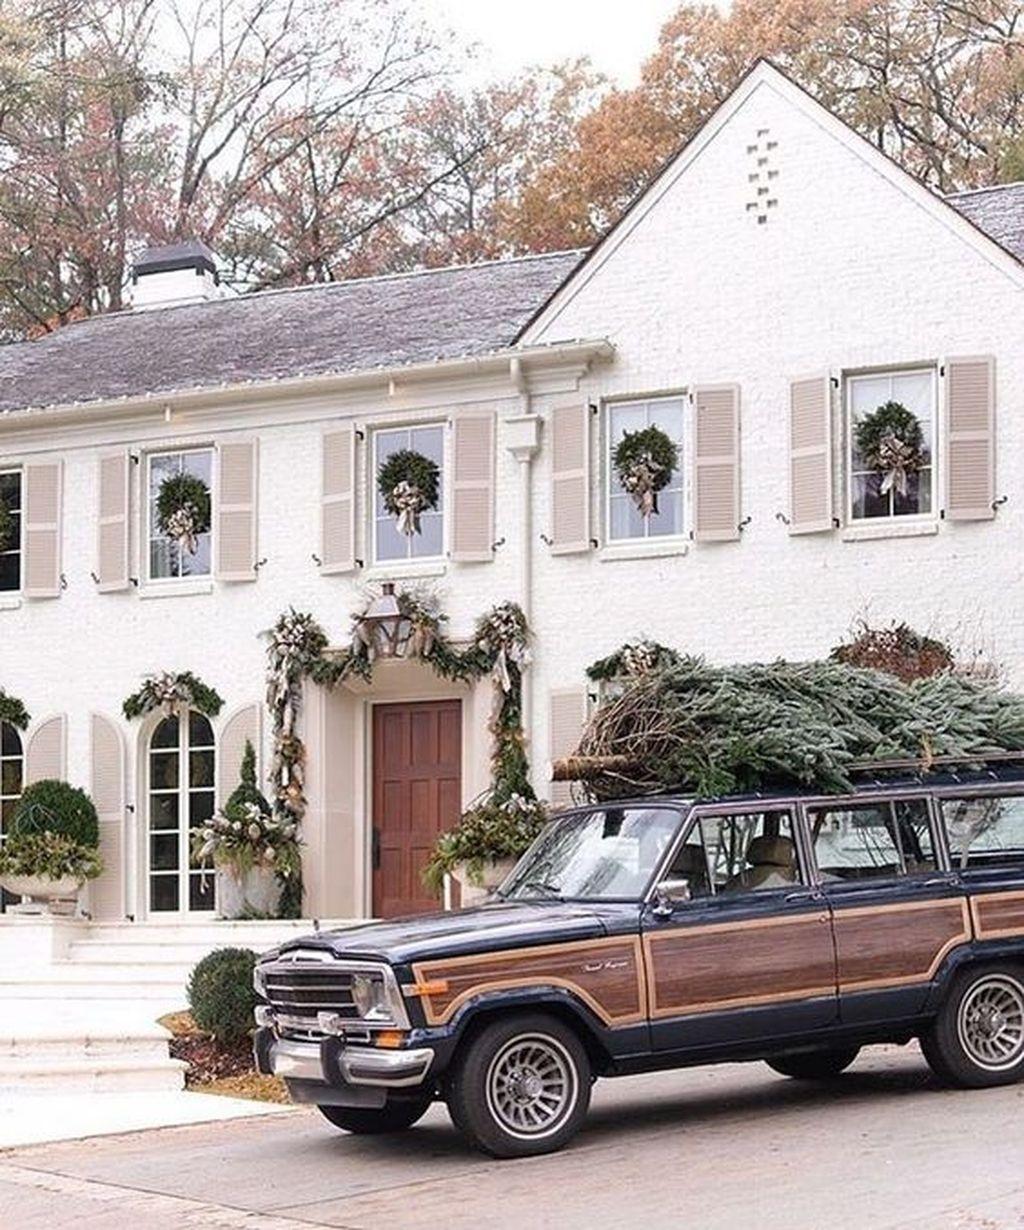 Amazing Winter Home Decoration Ideas 43